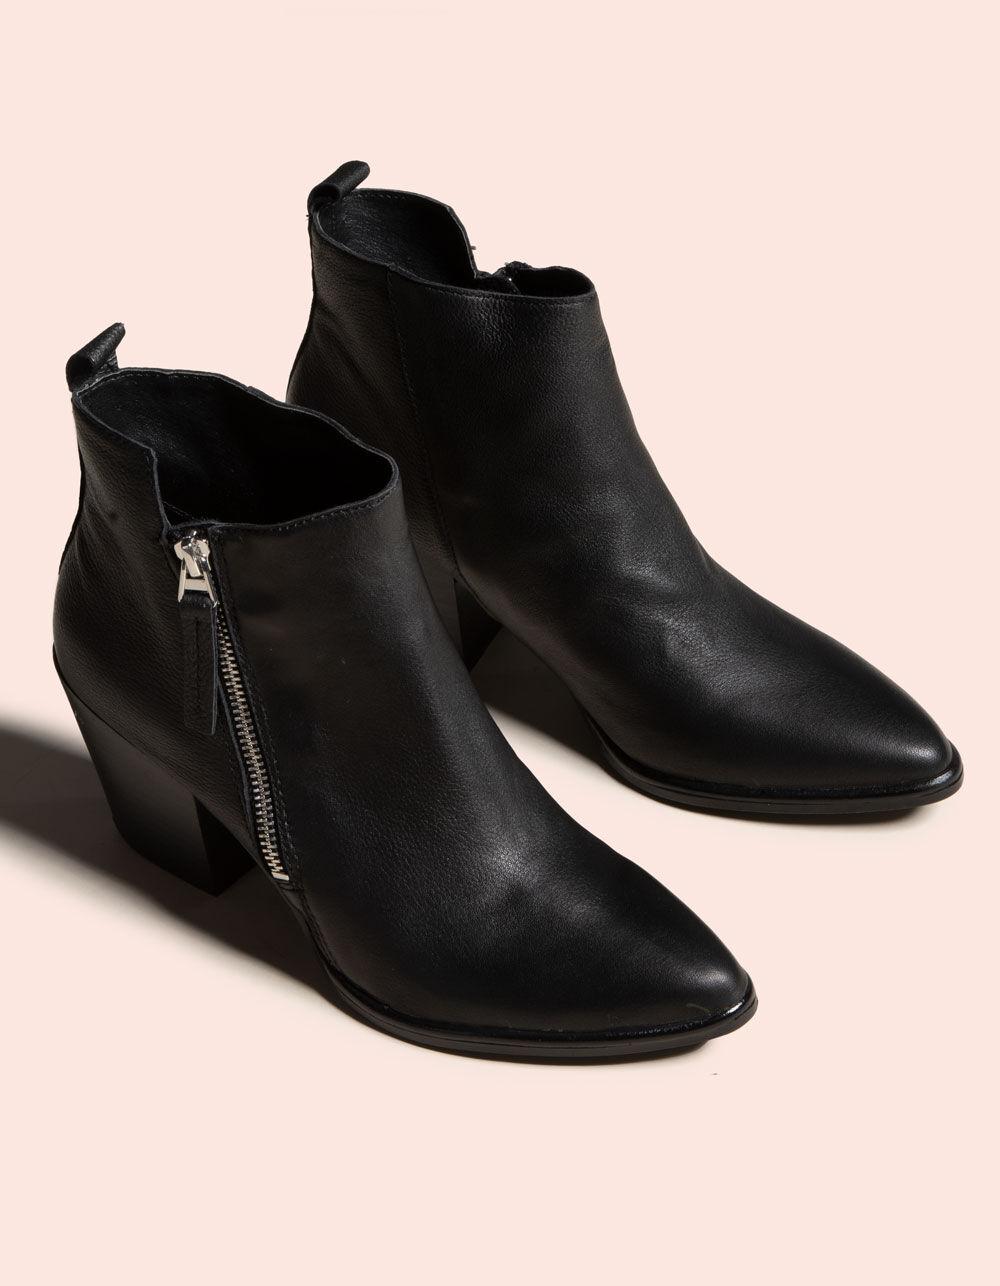 DOLCE VITA Rula Leather Black Booties